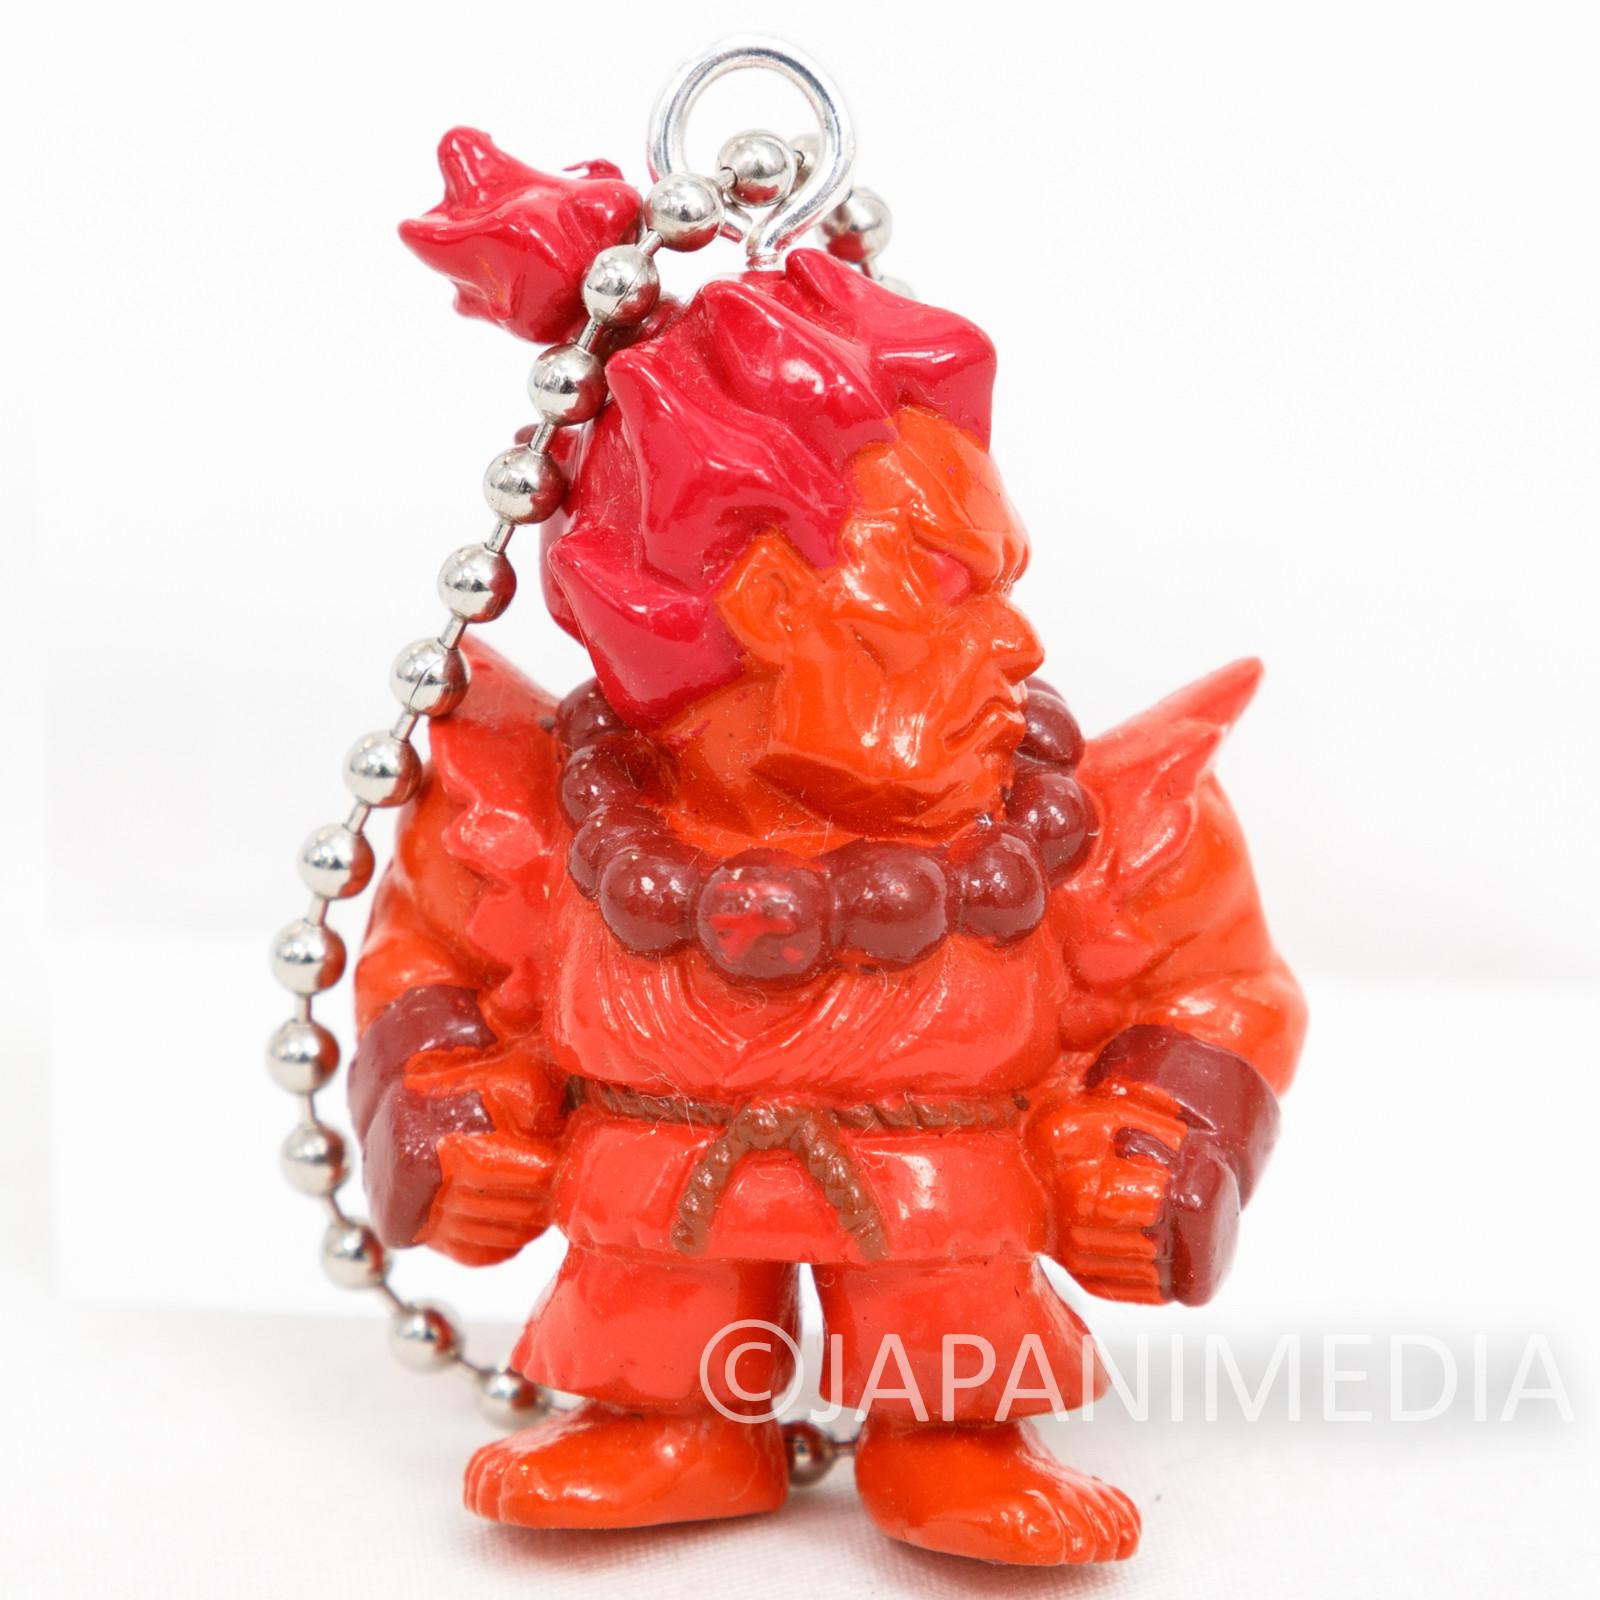 Street Fighter ZERO Gouki Akuma Figure Red color ver Ballchain JAPAN GAME CAPCOM